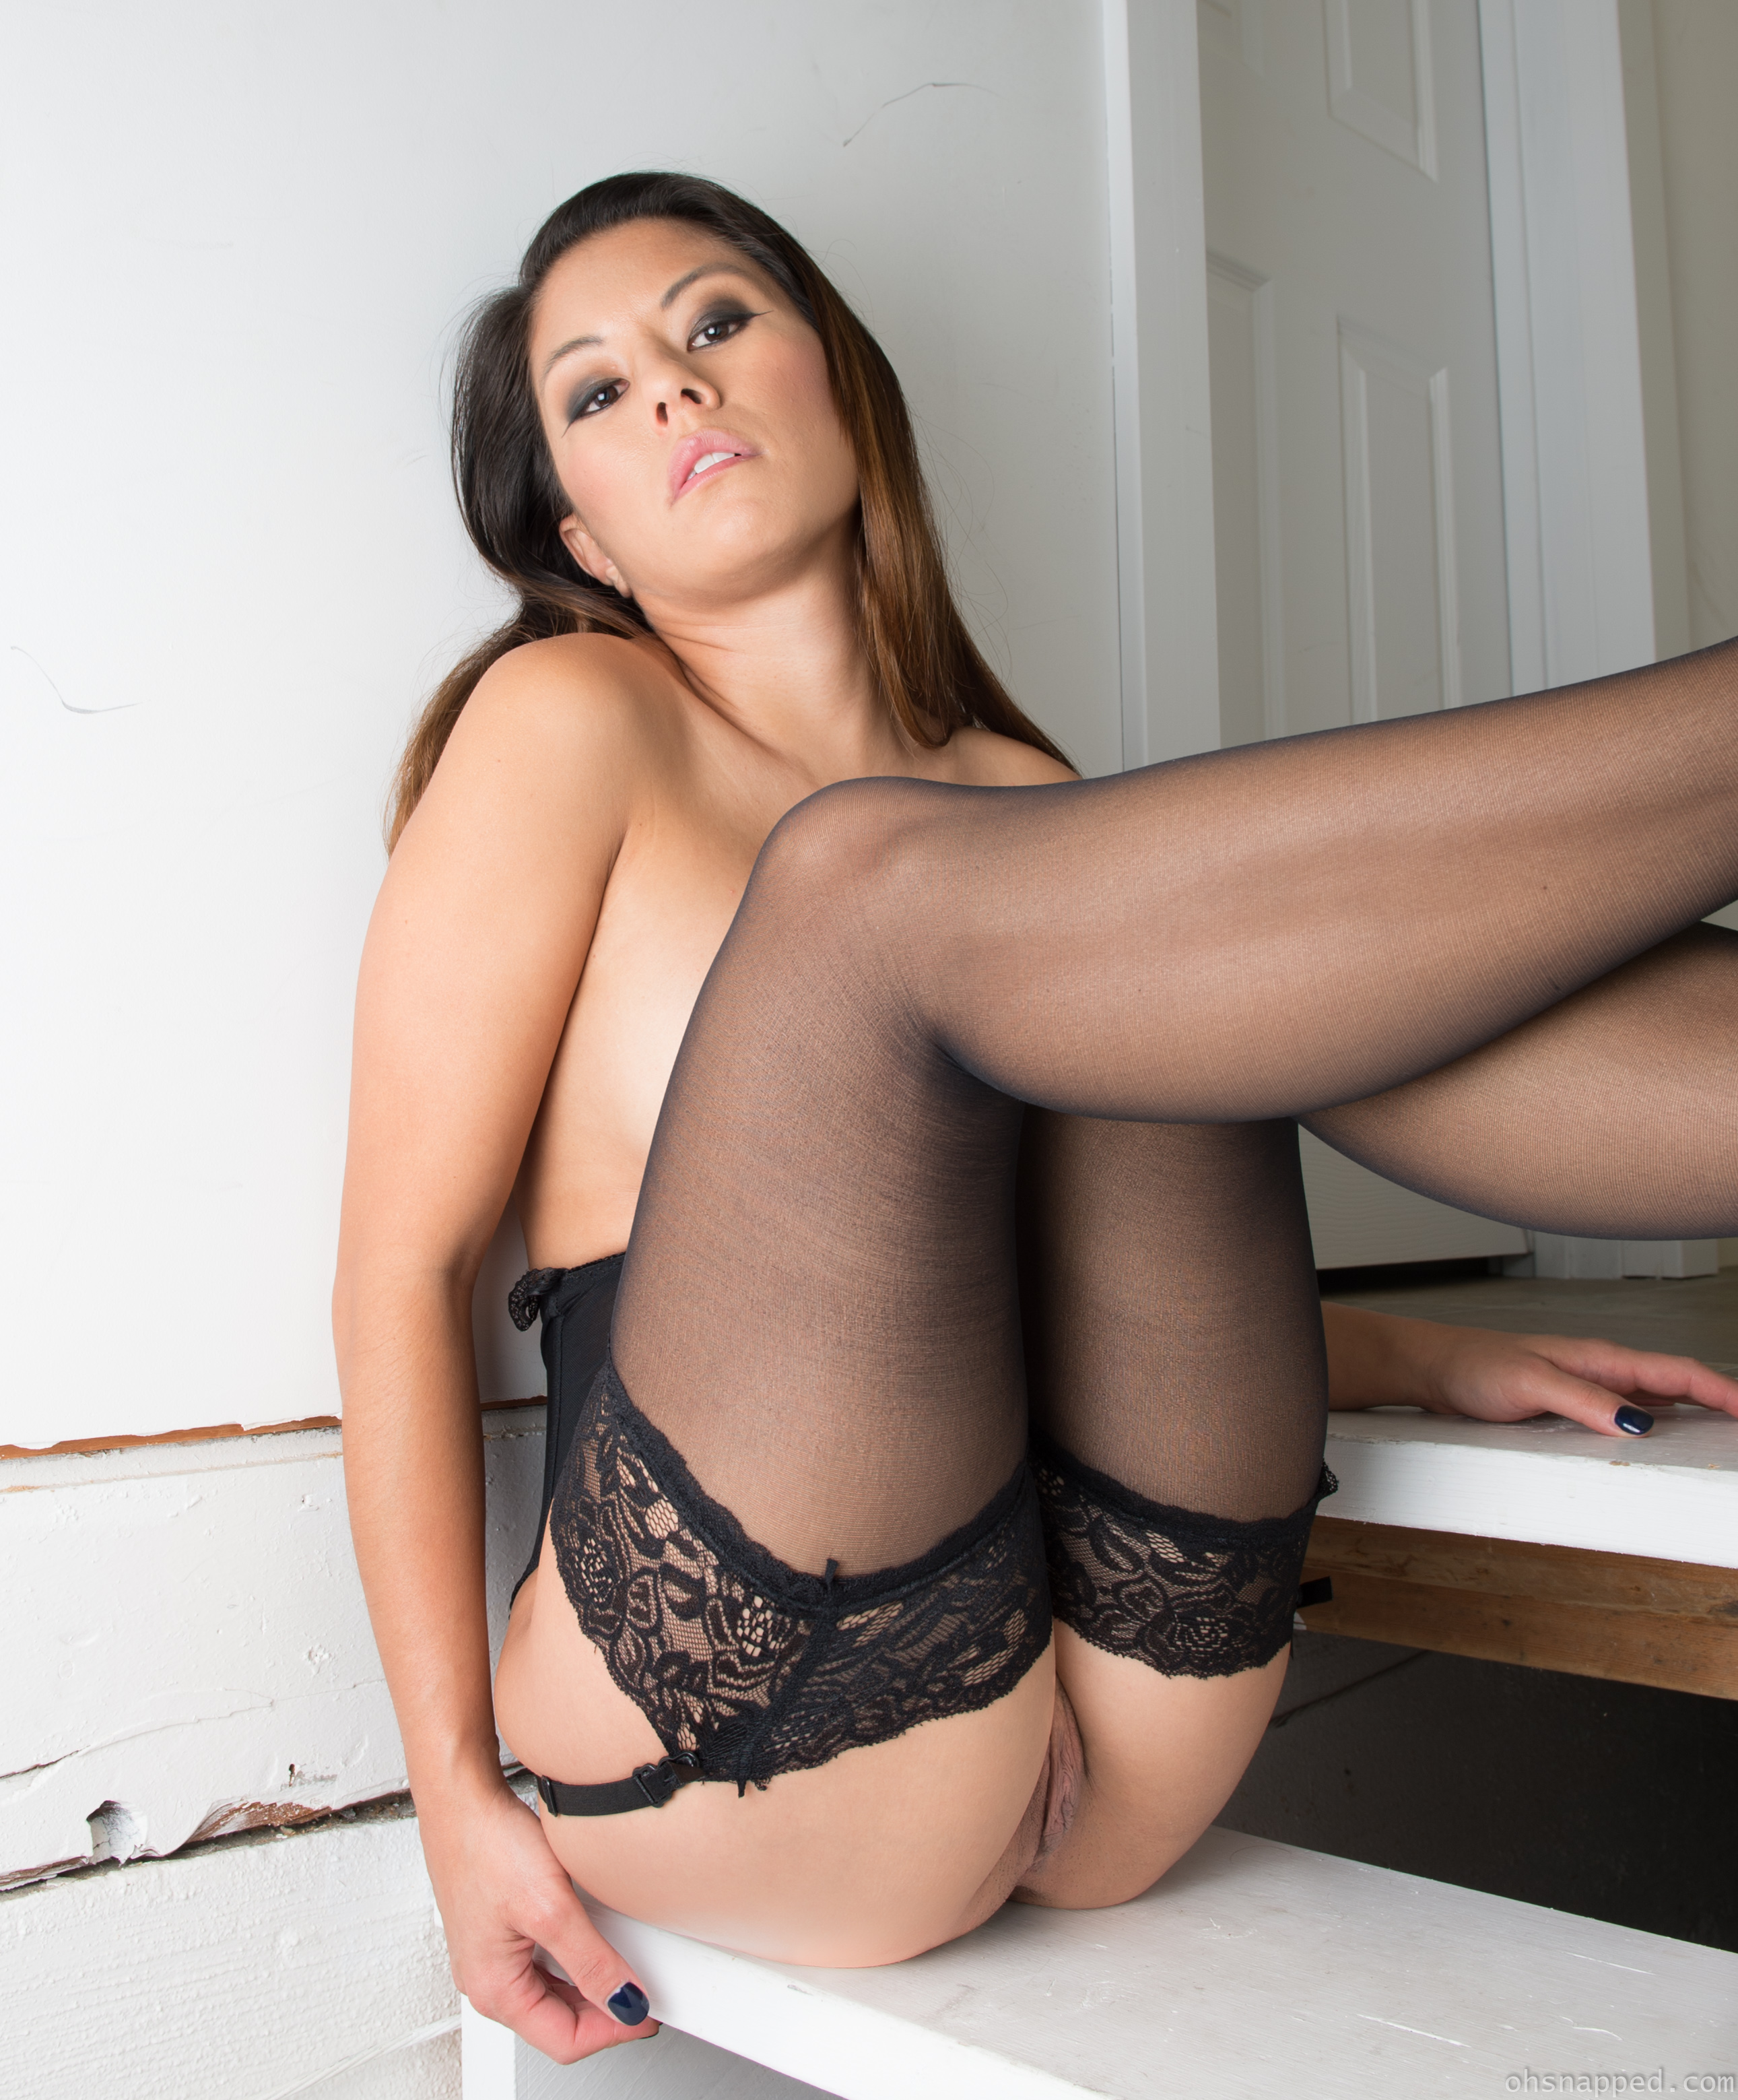 Pics legs porn Legs pics